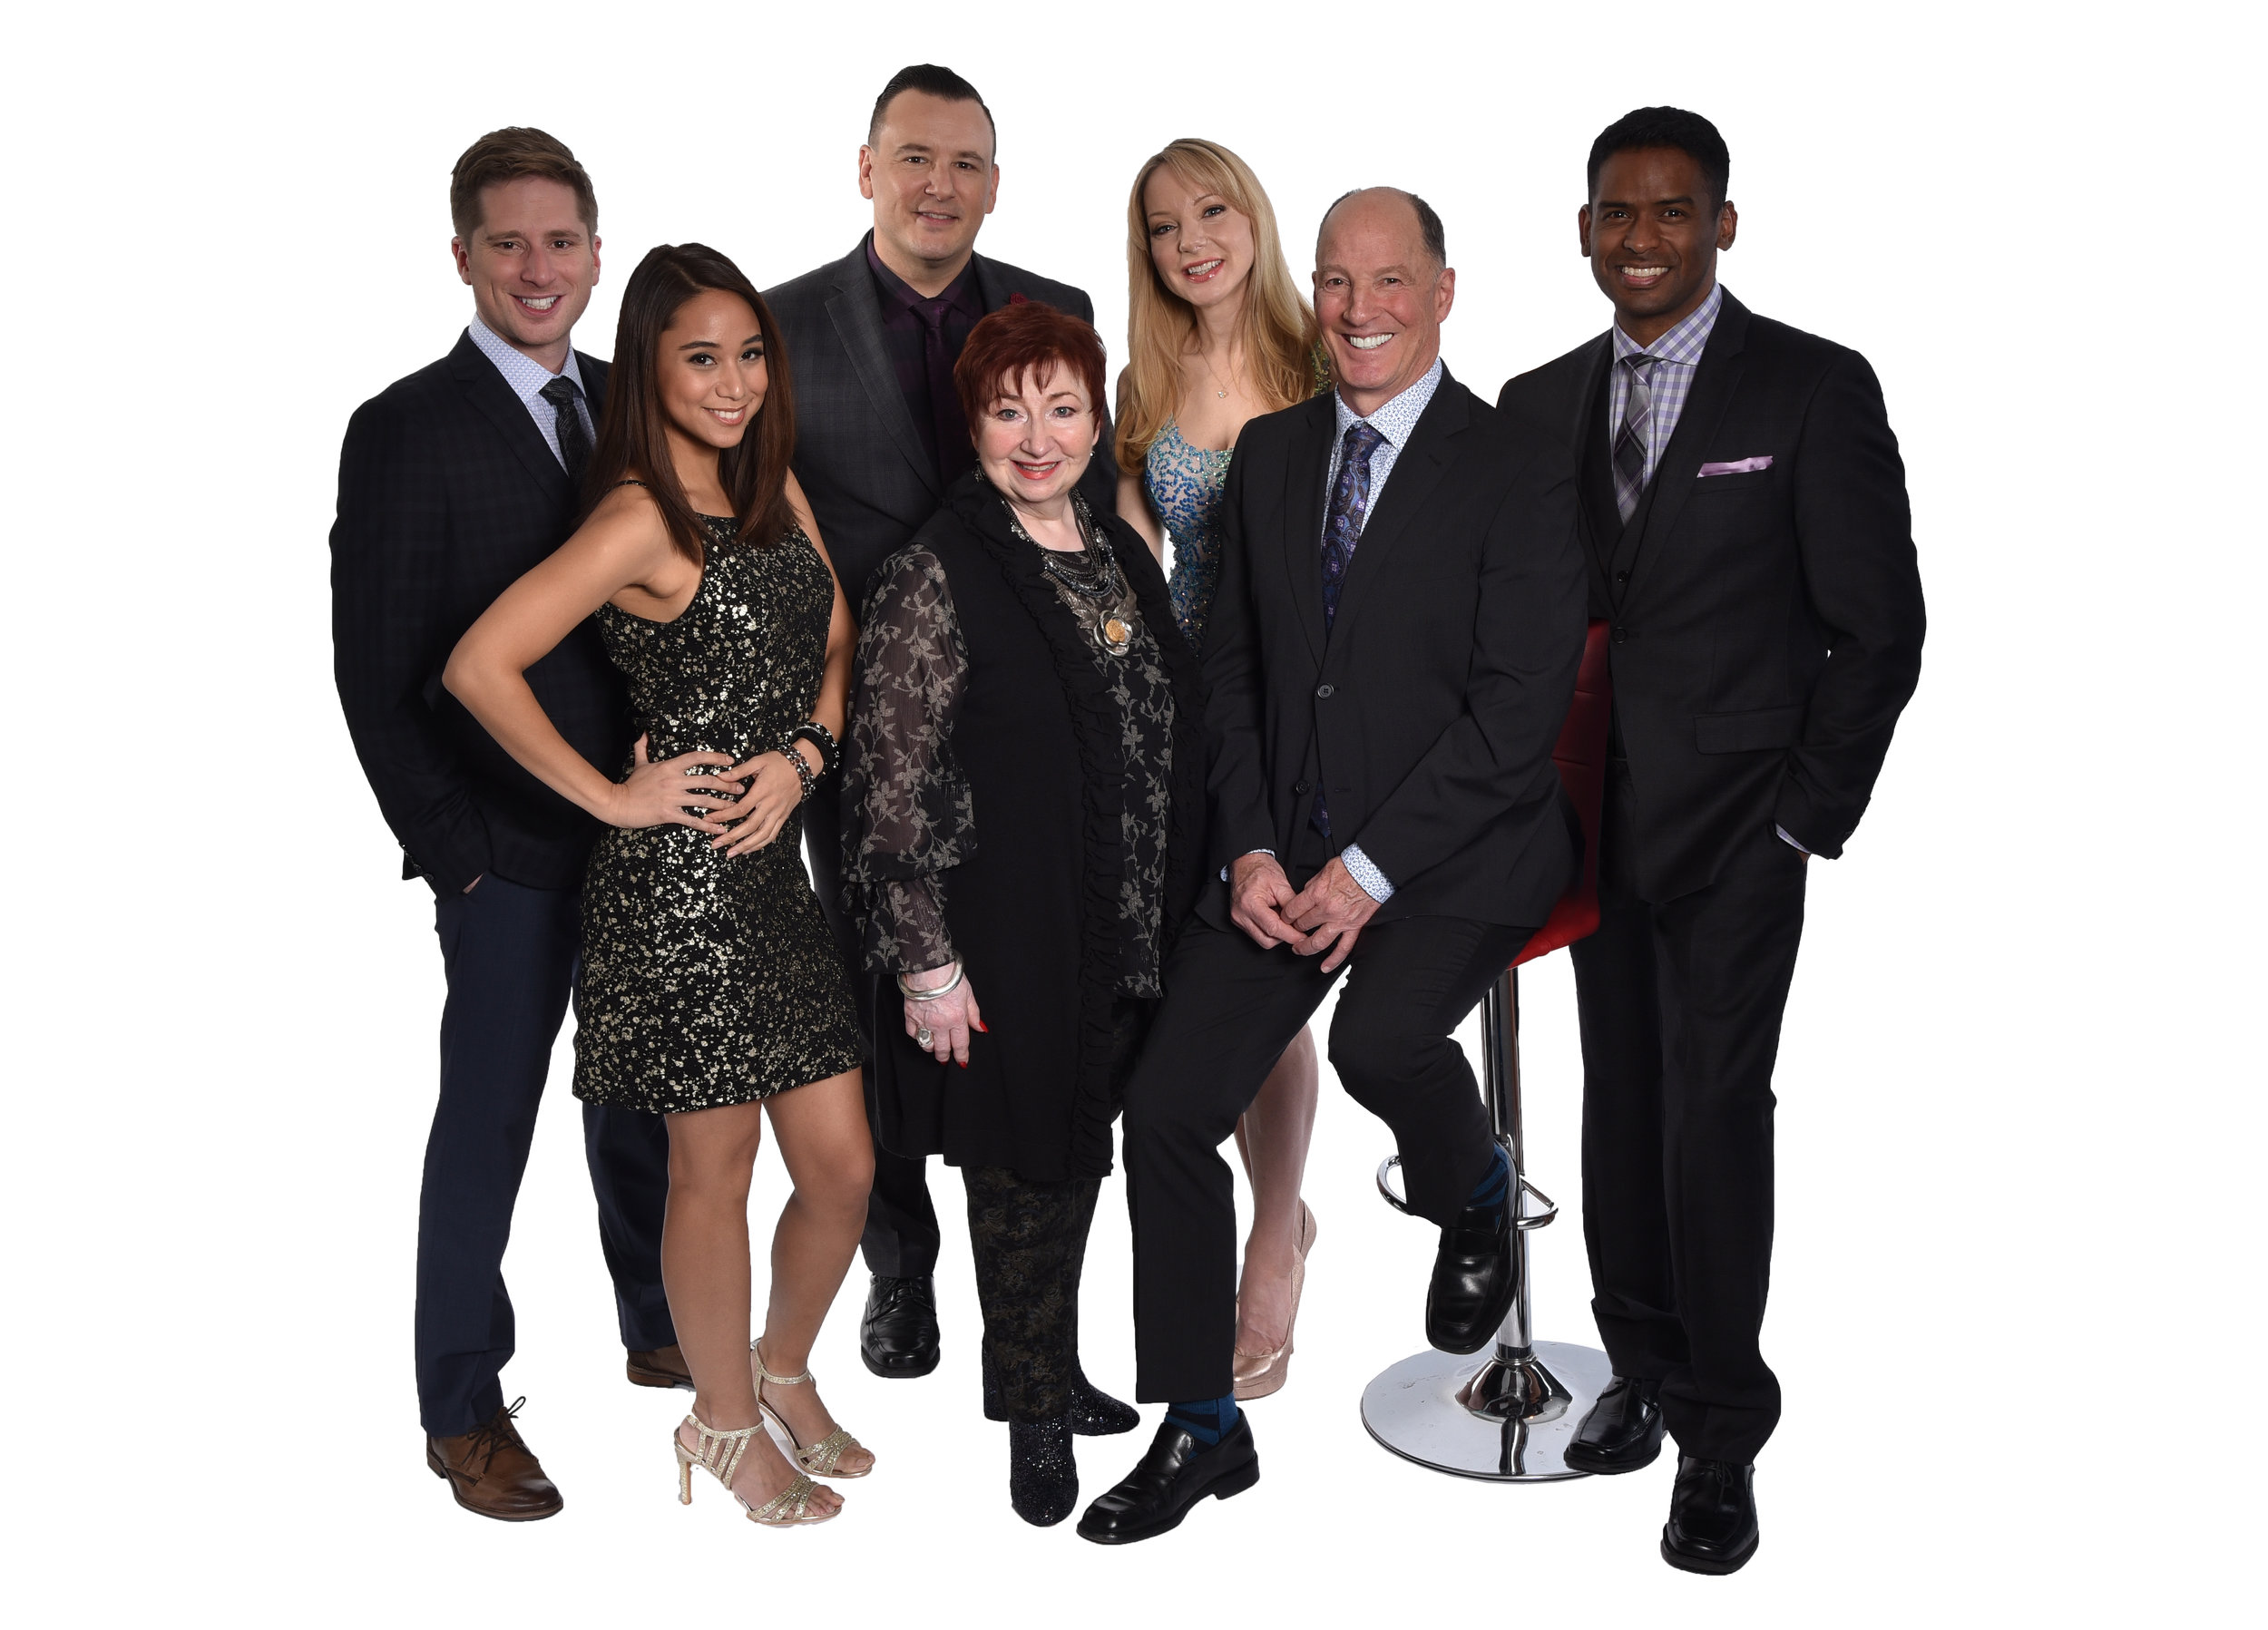 (left to right) Chris Wlson, Isabel Kanaan, Craig Lauzon, Luba Goy, Jessica Holmes, Don Ferguson, Darryl Hinds